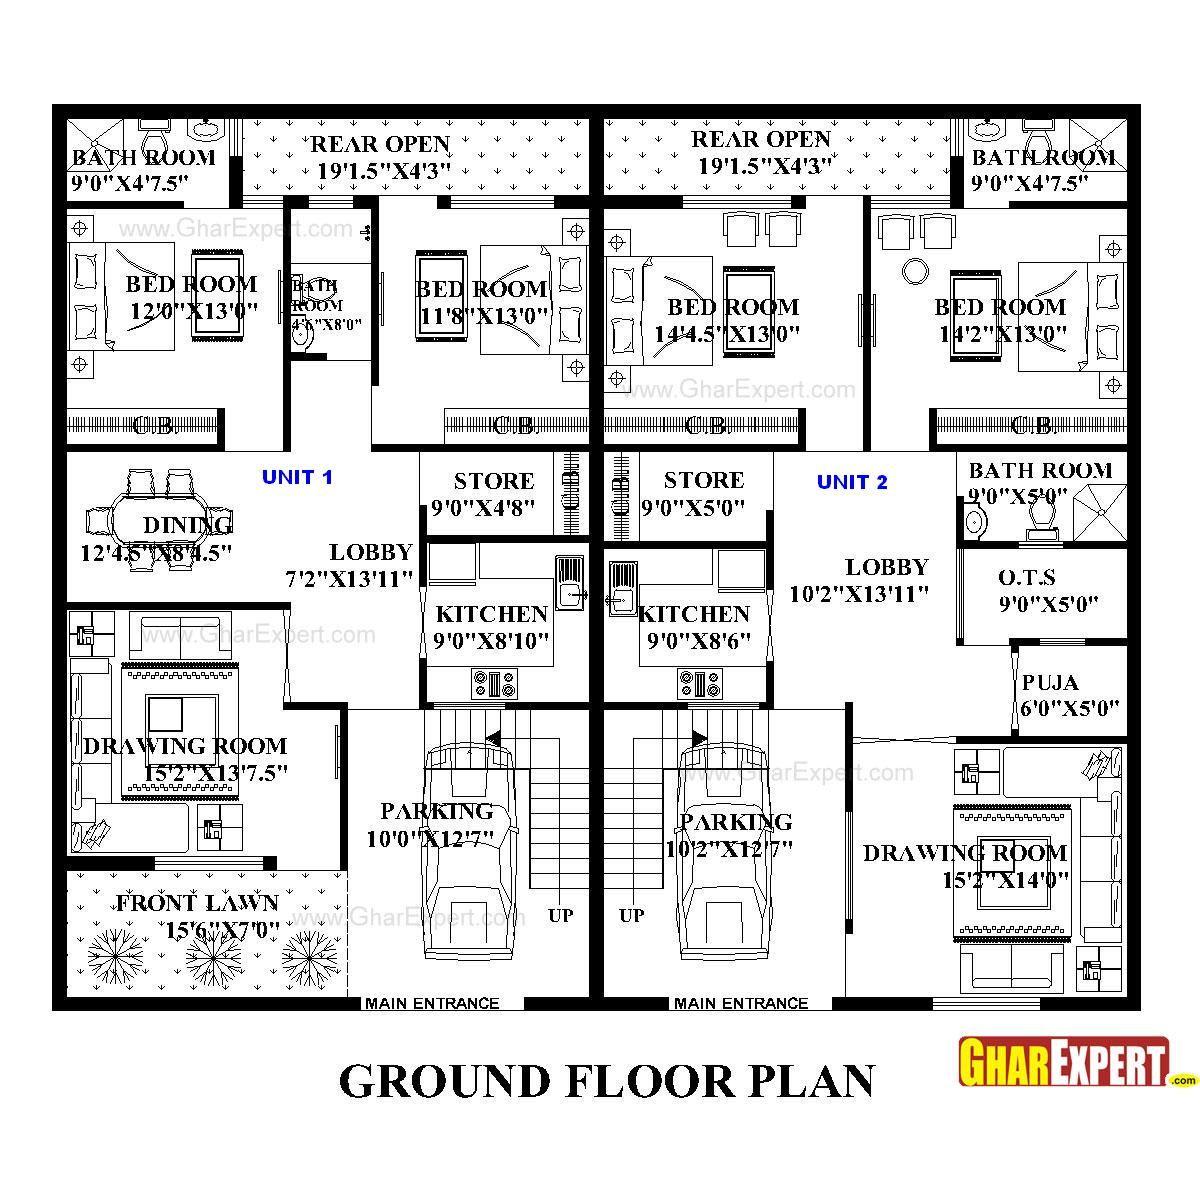 Architectural Plans Naksha Commercial And Residential Project Gharexpert Com Indian House Plans Budget House Plans Home Design Floor Plans